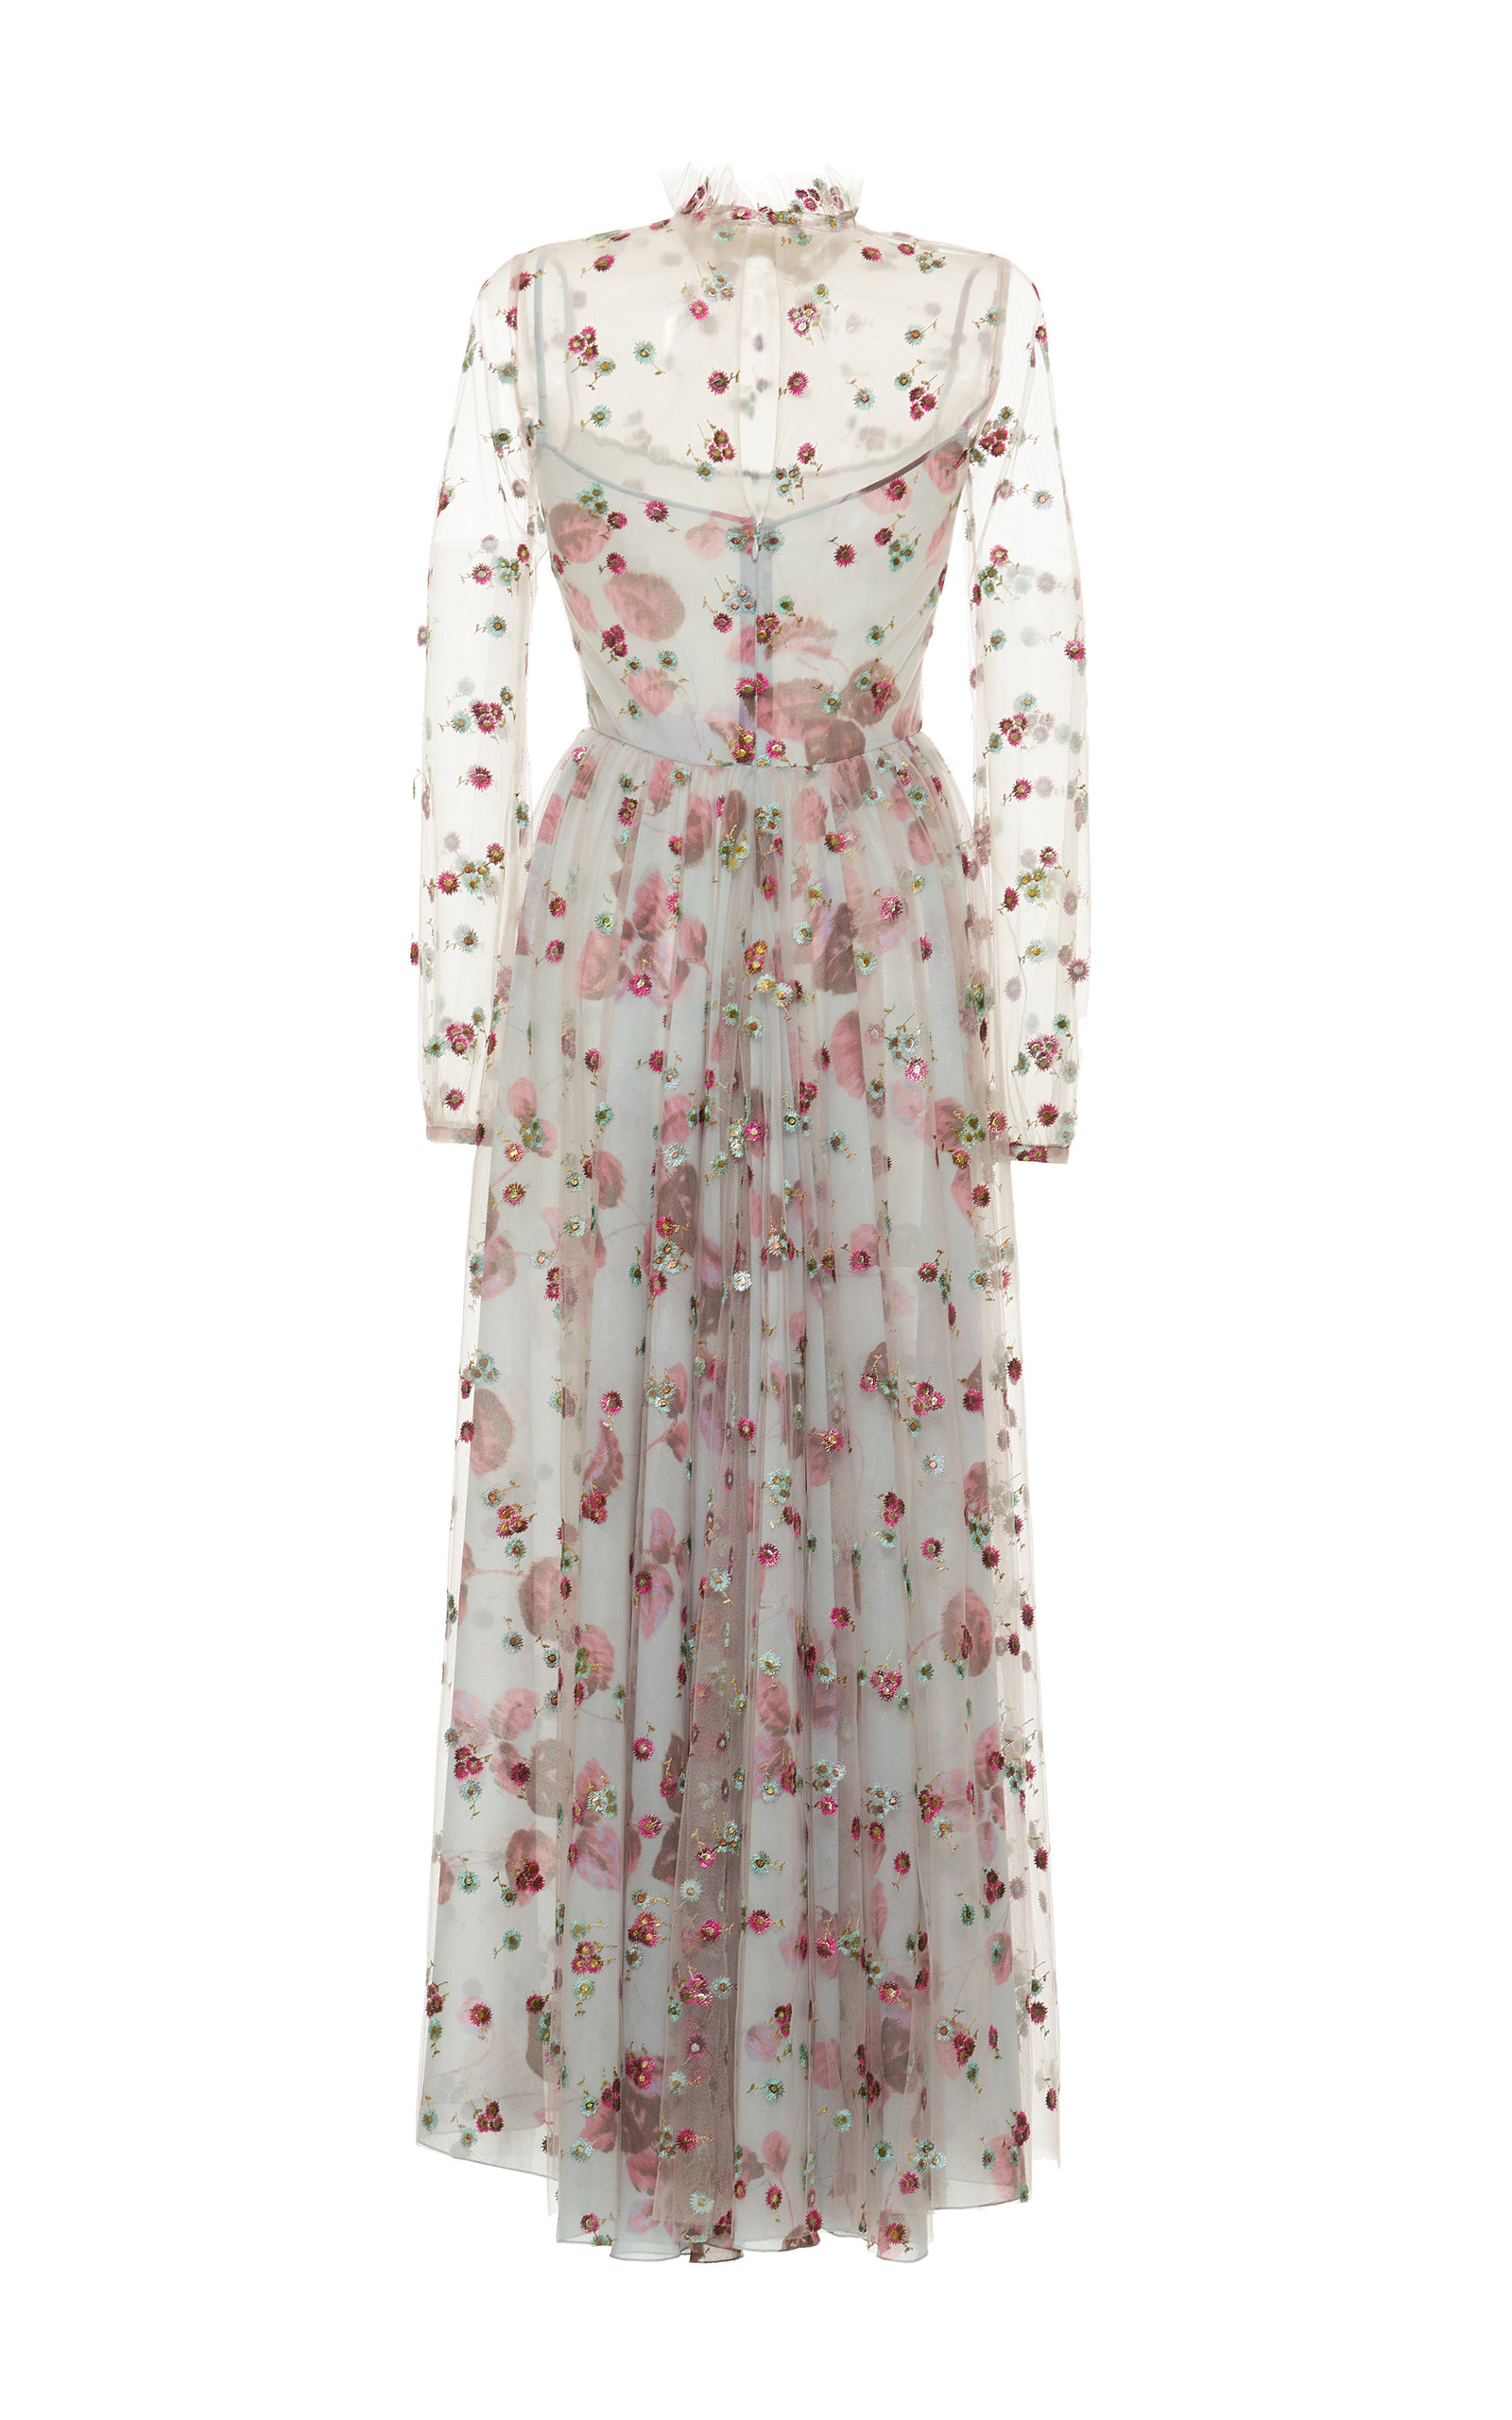 ec31c1b49723e4 Luisa BeccariaTulle Floral Embroidered Maxi Dress. CLOSE. Loading. Loading